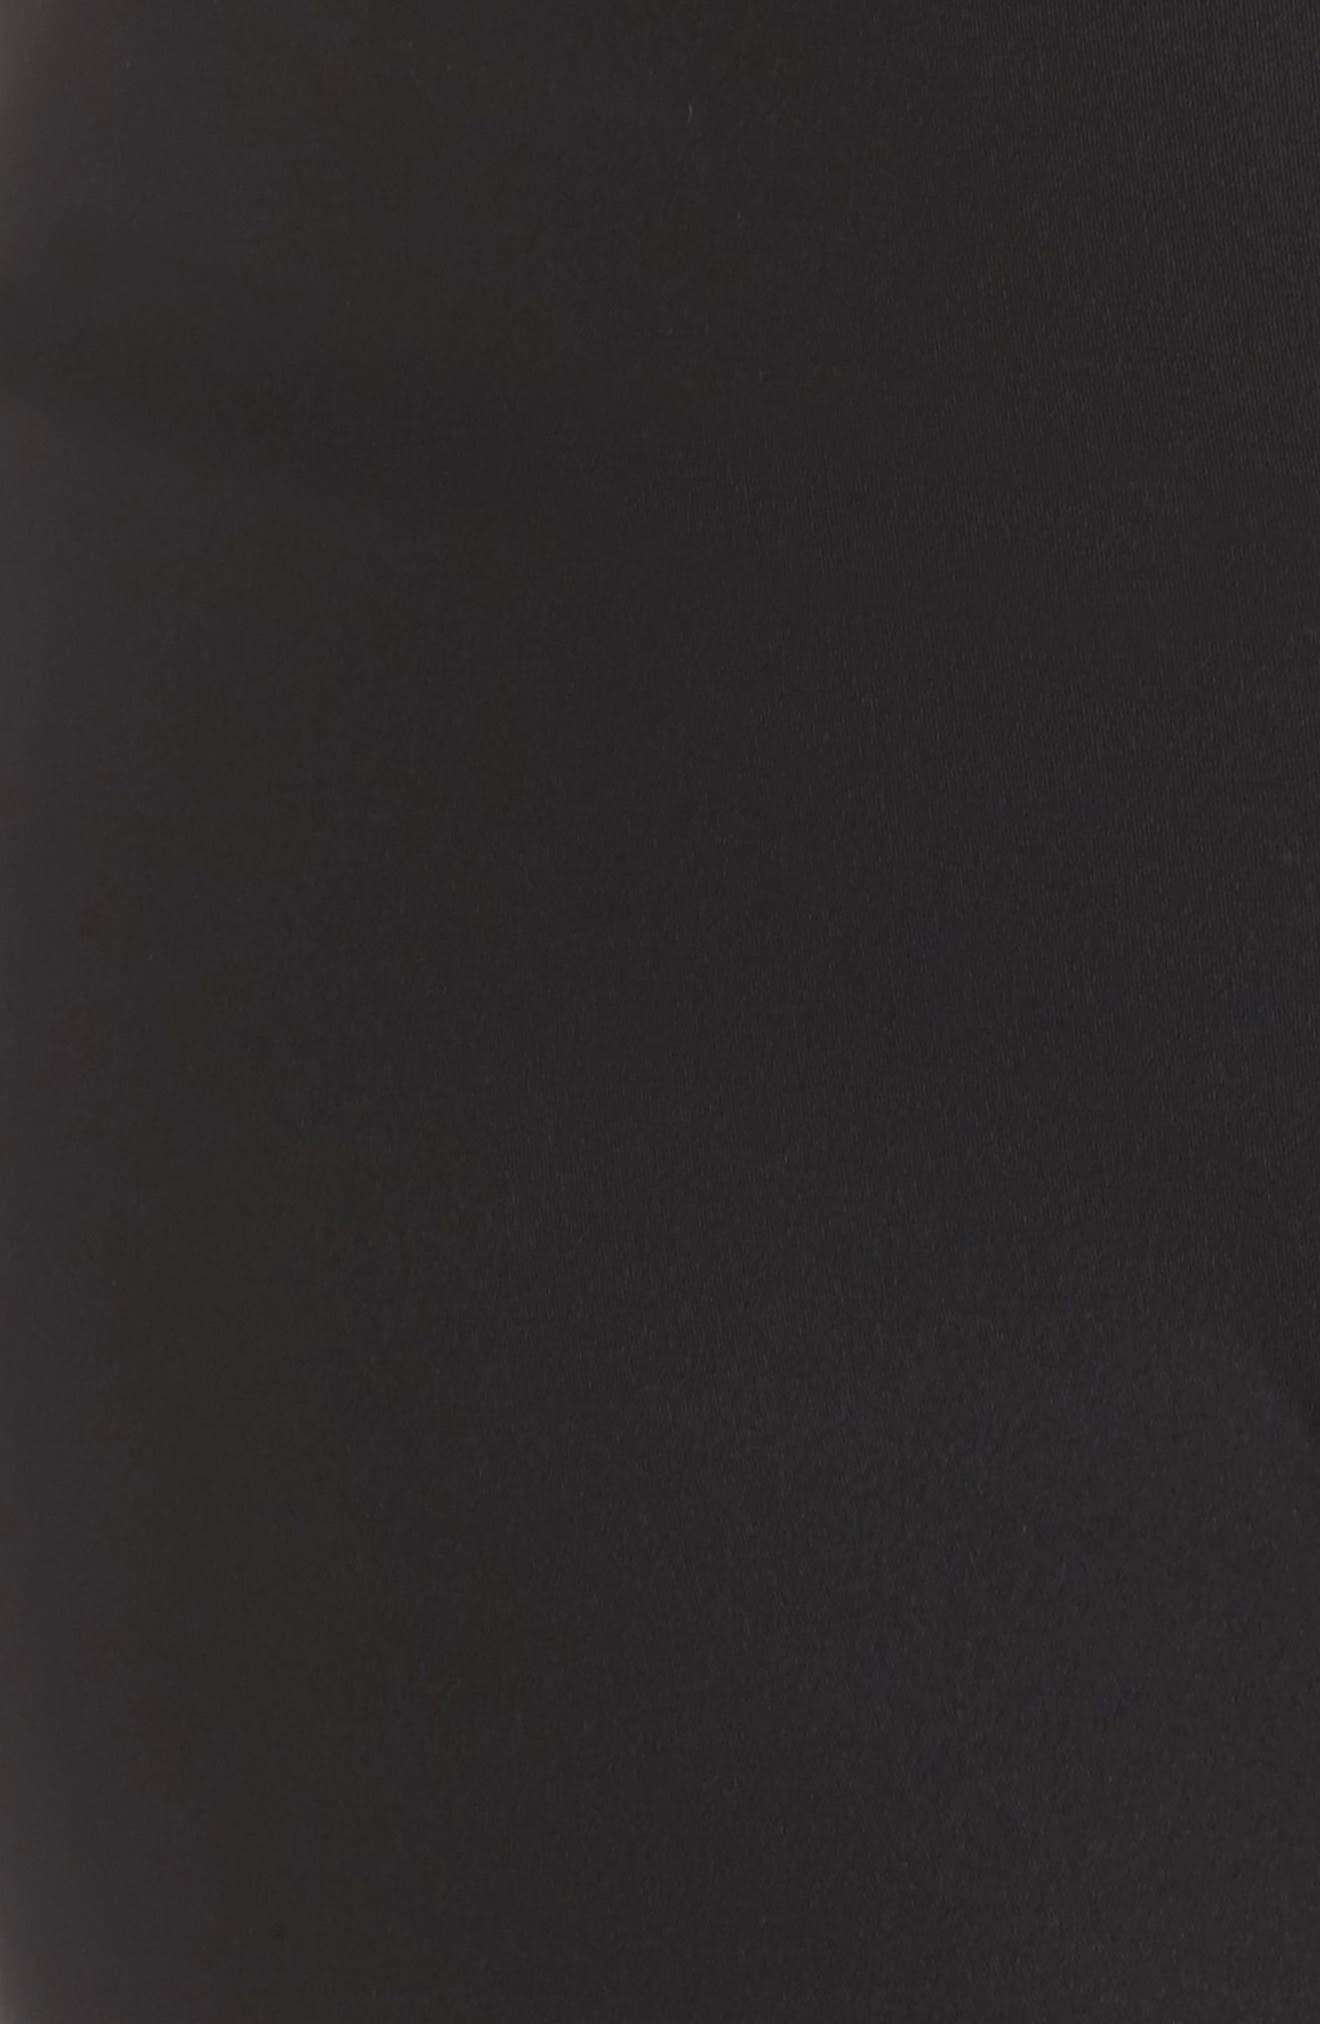 Kendall Uprising Capris,                             Alternate thumbnail 5, color,                             Black/ White